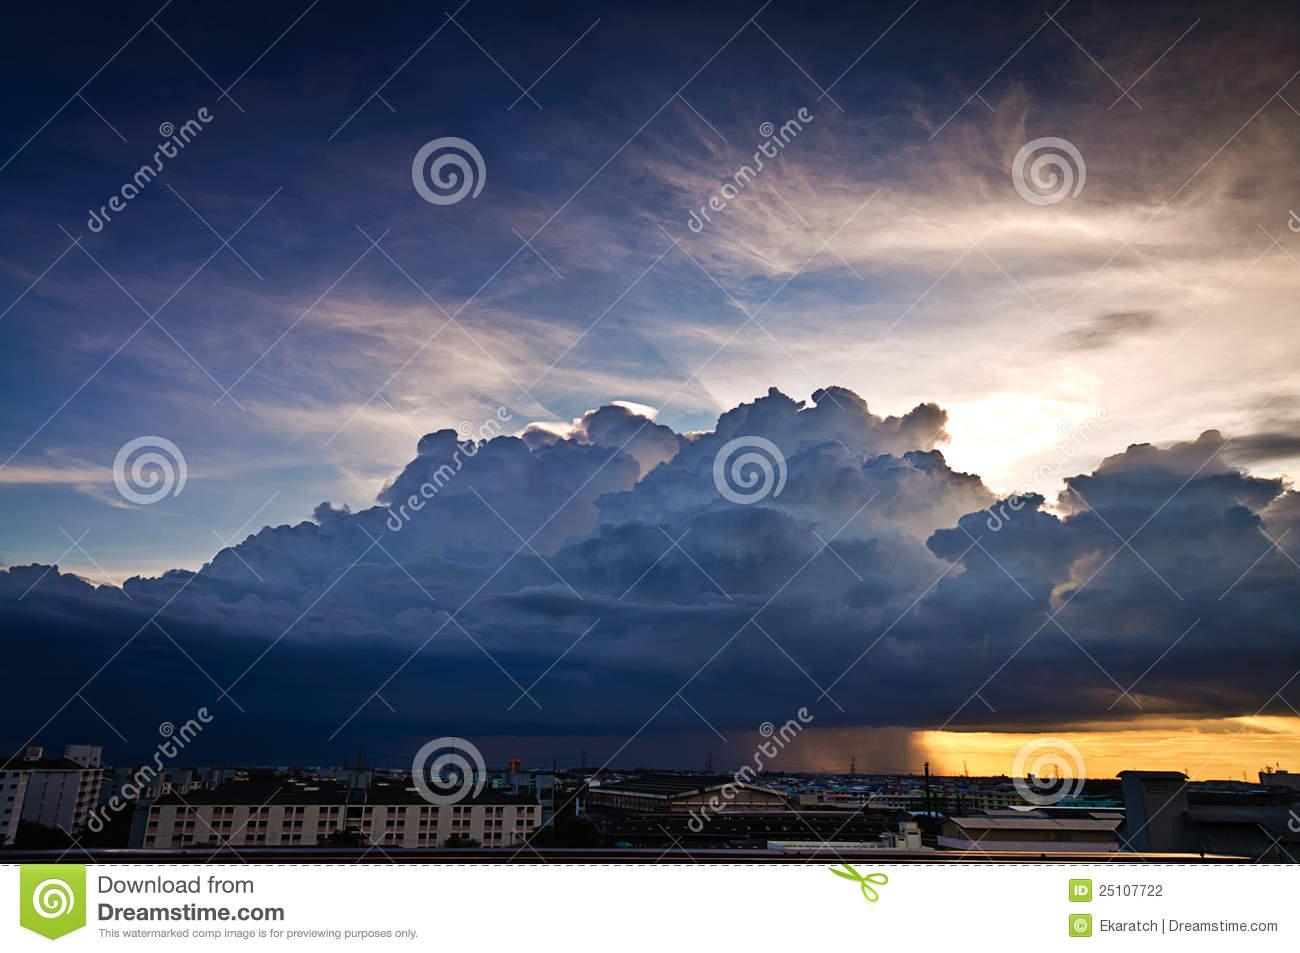 Nimbus Clouds Clipart - Clipart Kid